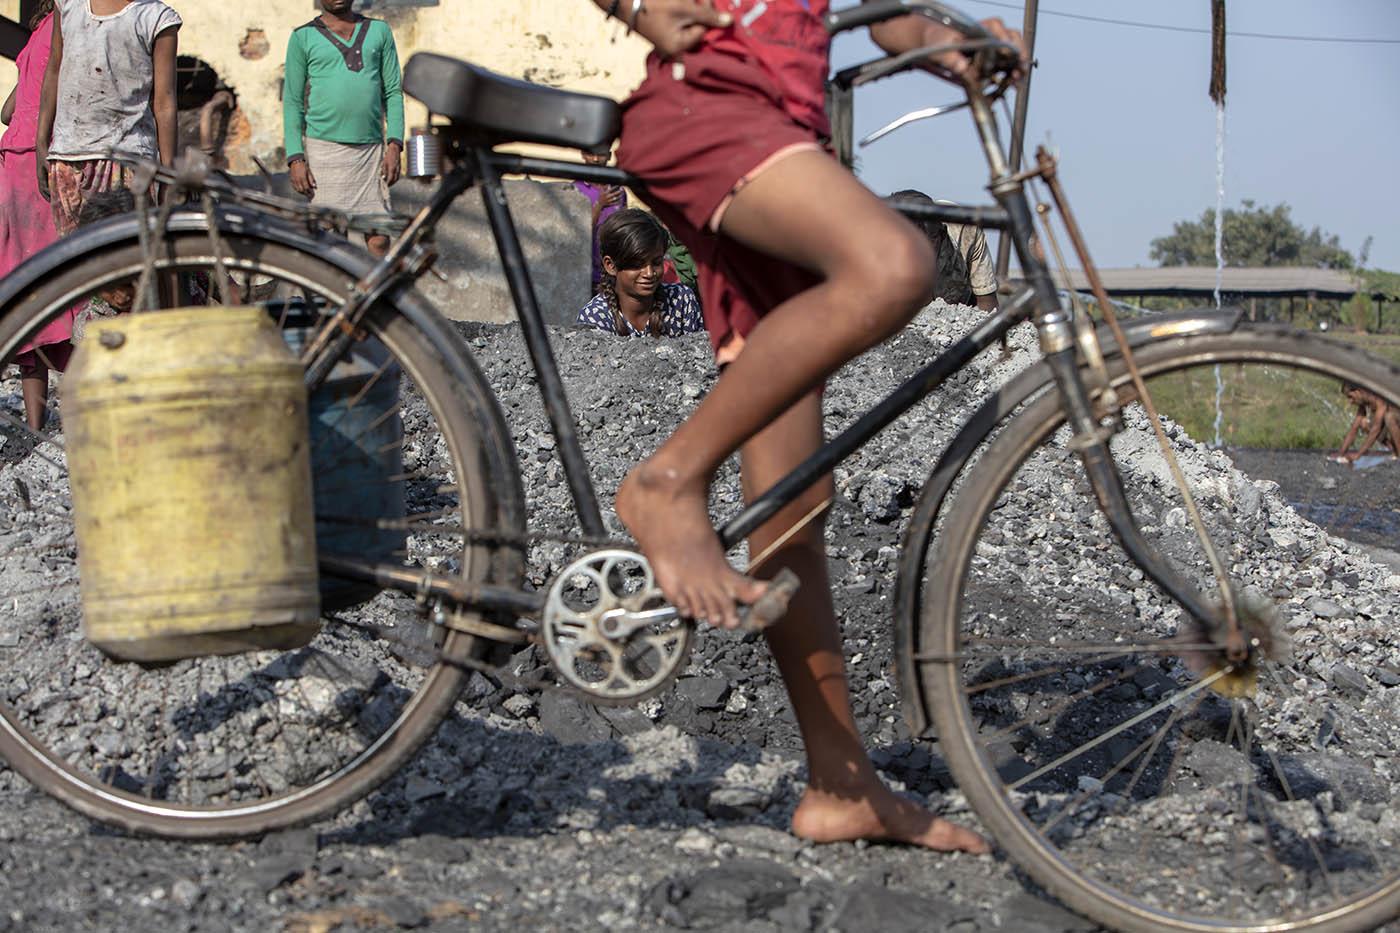 Ann_Johansson_The Face of Coal_05.JPG